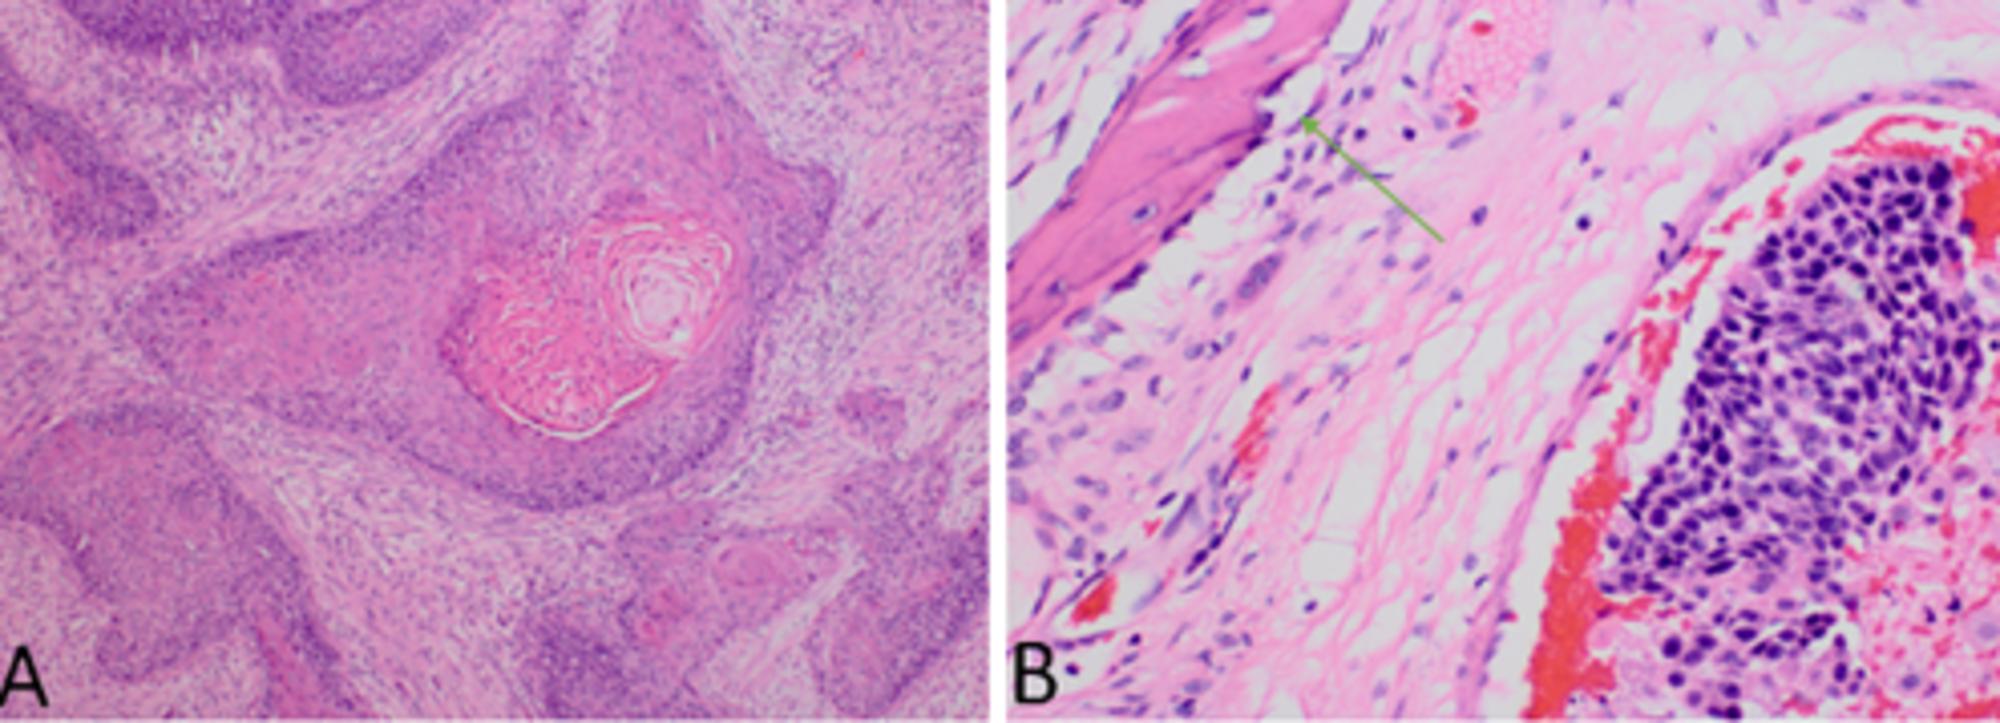 squamous cell carcinoma sinonasal papilloma)